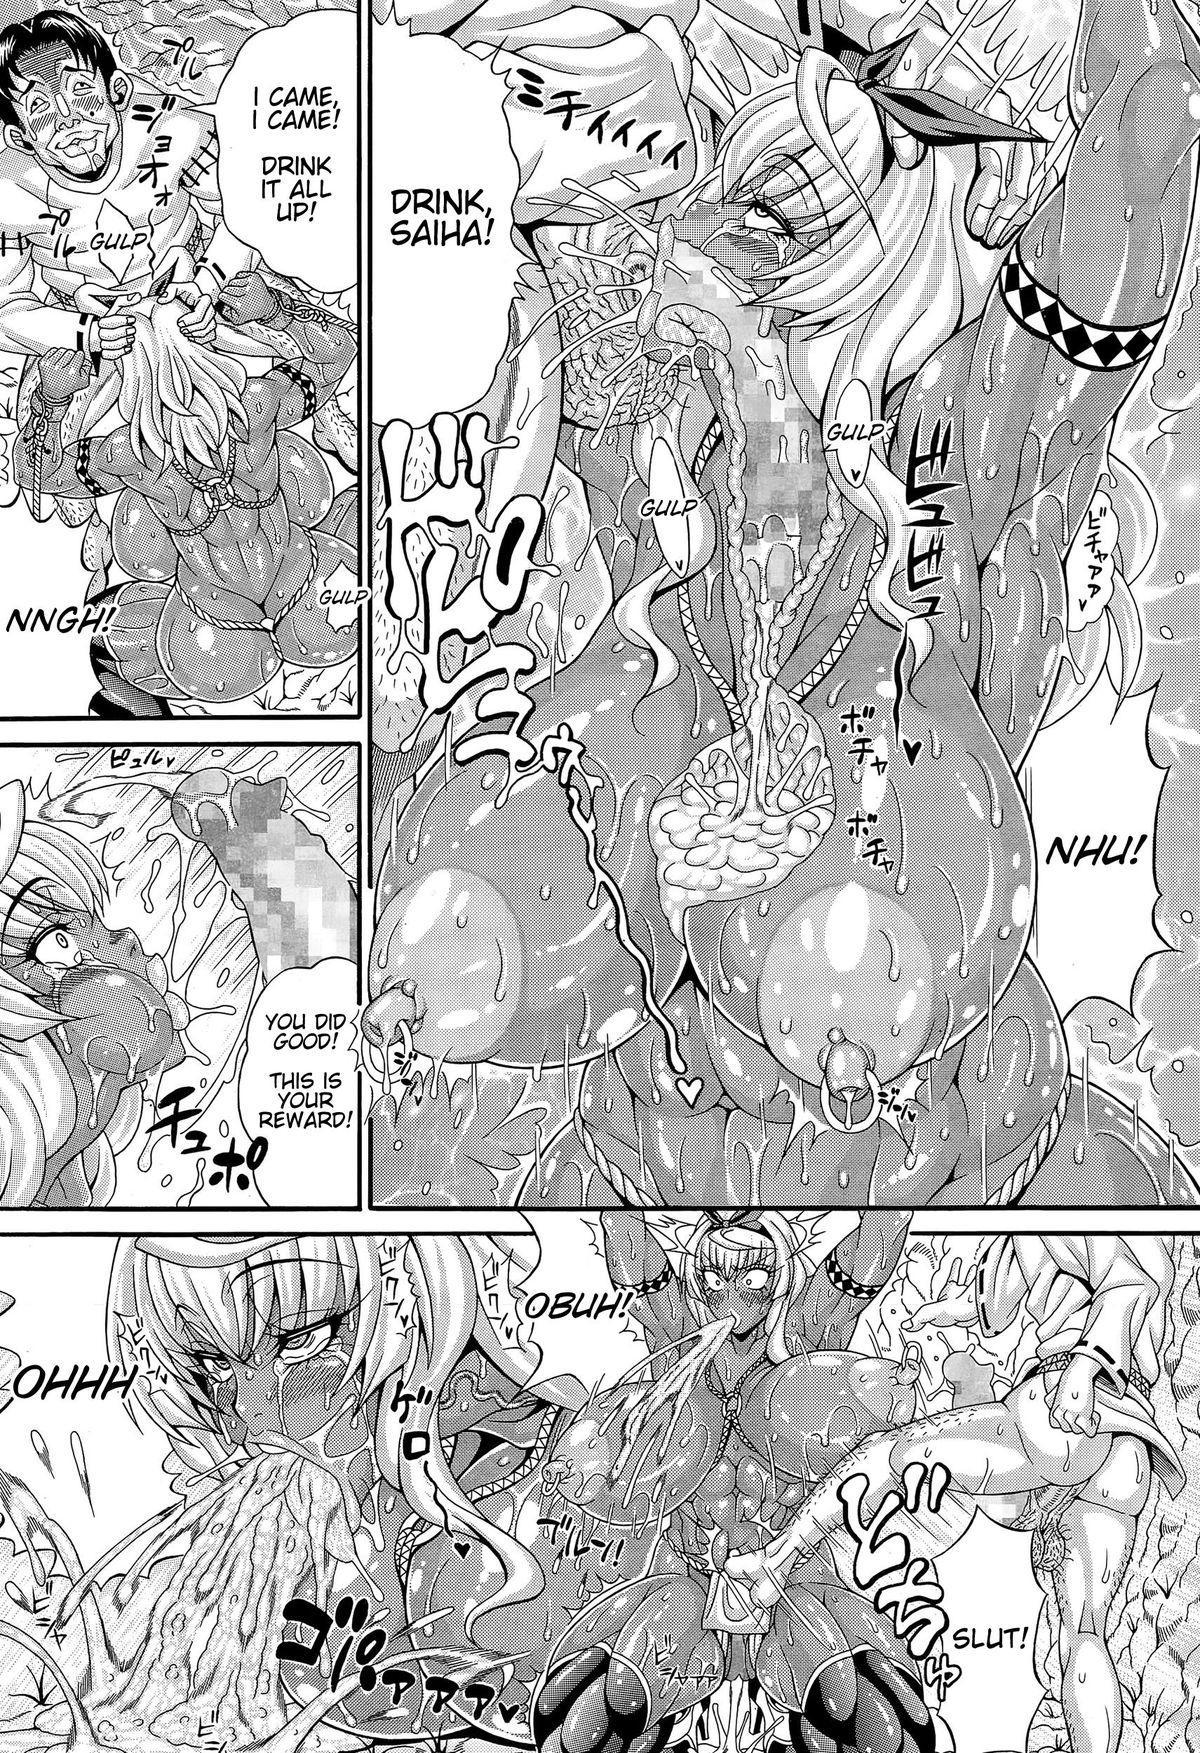 [Andou Hiroyuki] Mahoutsukai Musou ~Sengoku Pakohime Kasshoku Kinniku Onna Hen~   Peerless 30 Year Old Virgin - Warring States Muscled Brown Fuck Princess (COMIC Tenma 2015-06) [English] [Natty Translations] 6